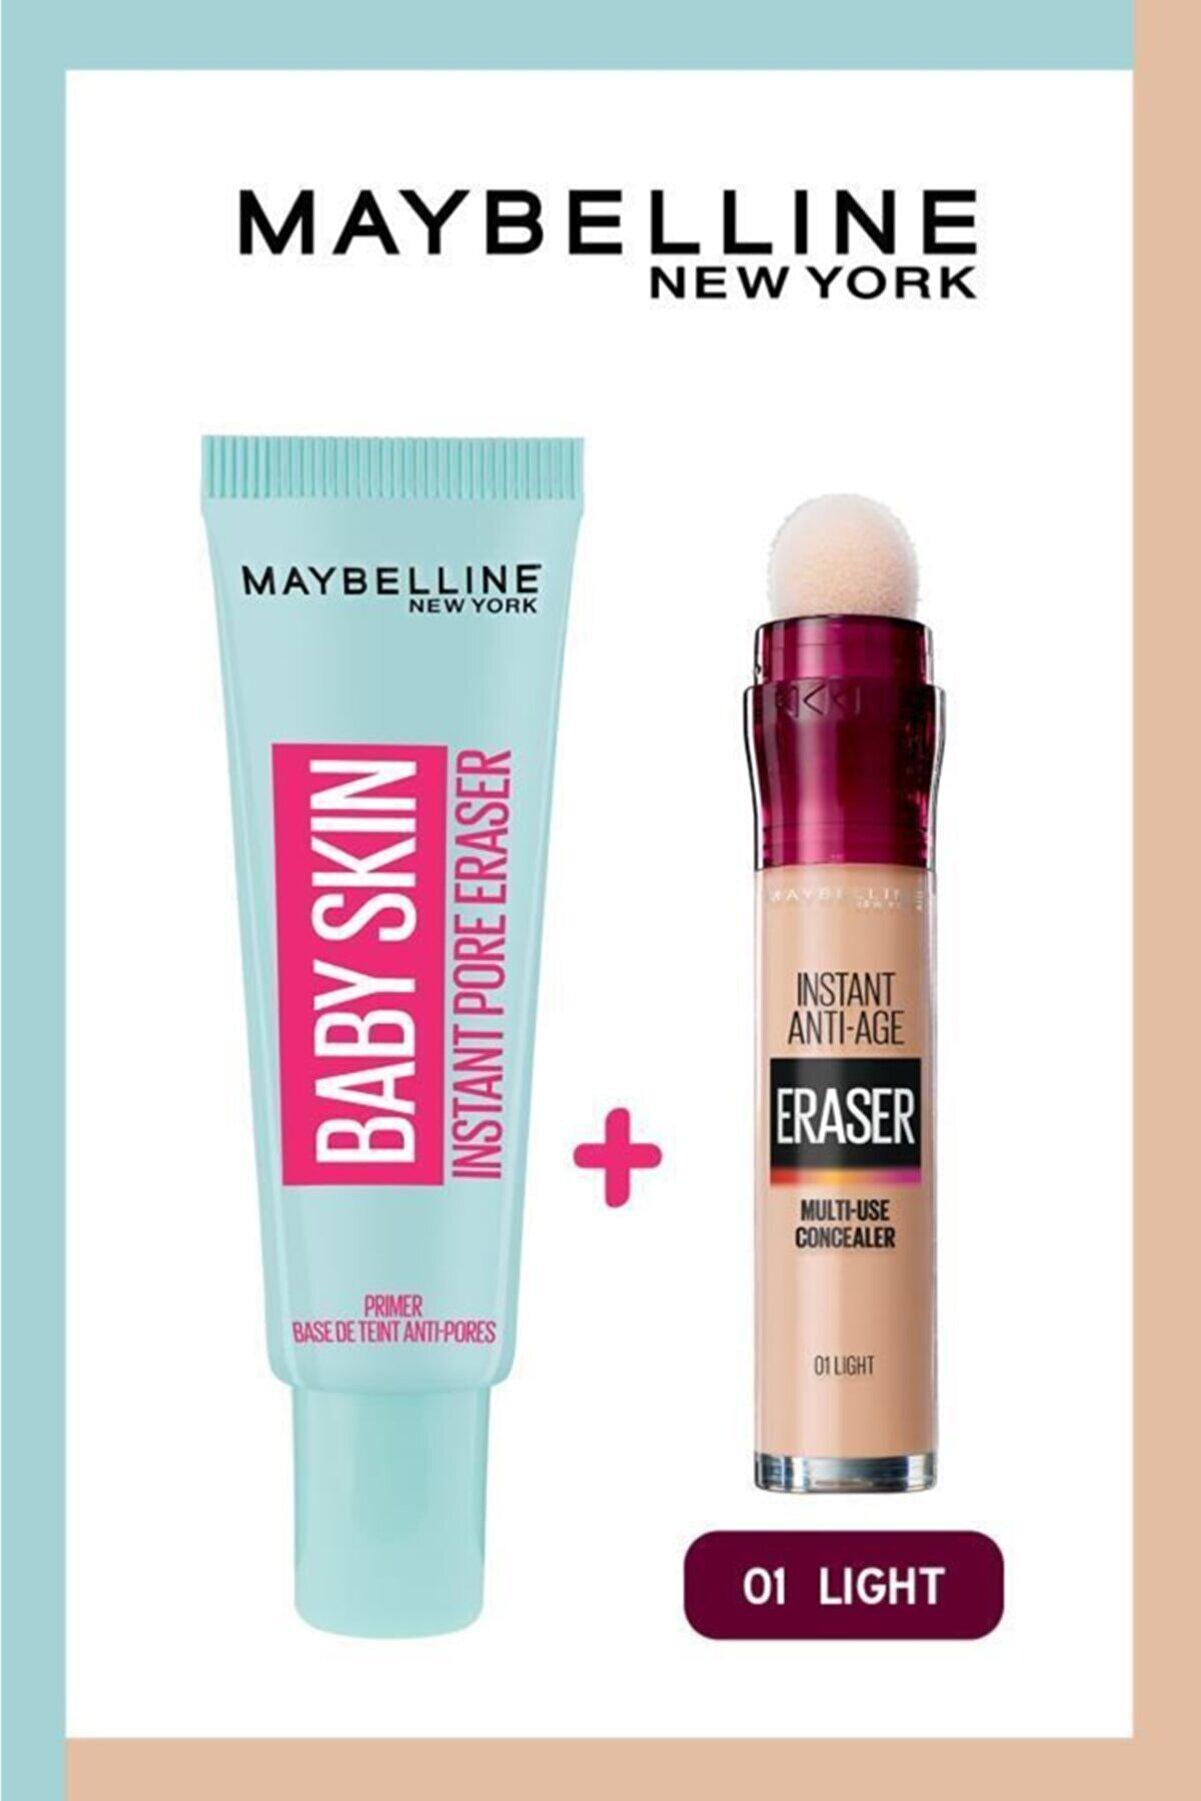 Maybelline New York Baby Skin Makyaj Bazı + Instant Anti Age Eraser Kapatıcı 01 Light